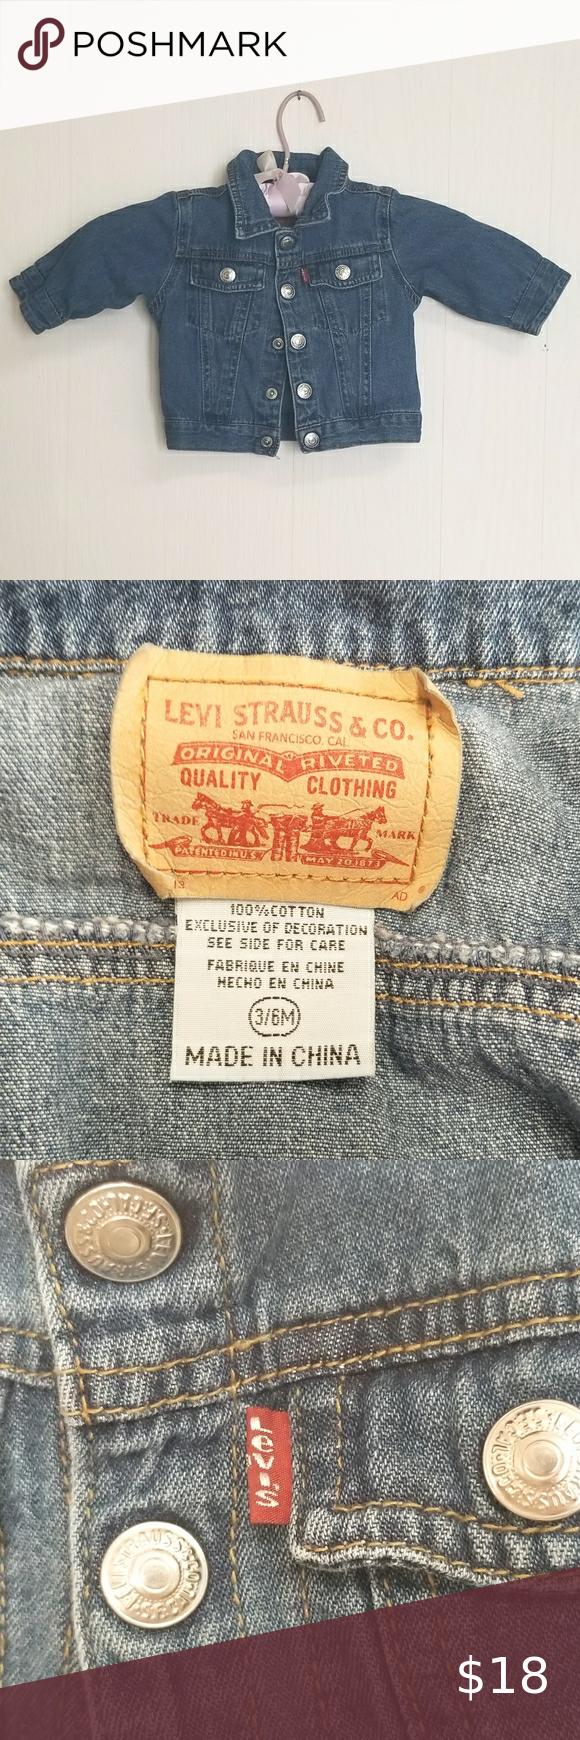 Baby Levi S Denim Jacket Levis Denim Jacket Levis Denim Denim Jacket [ 1740 x 580 Pixel ]